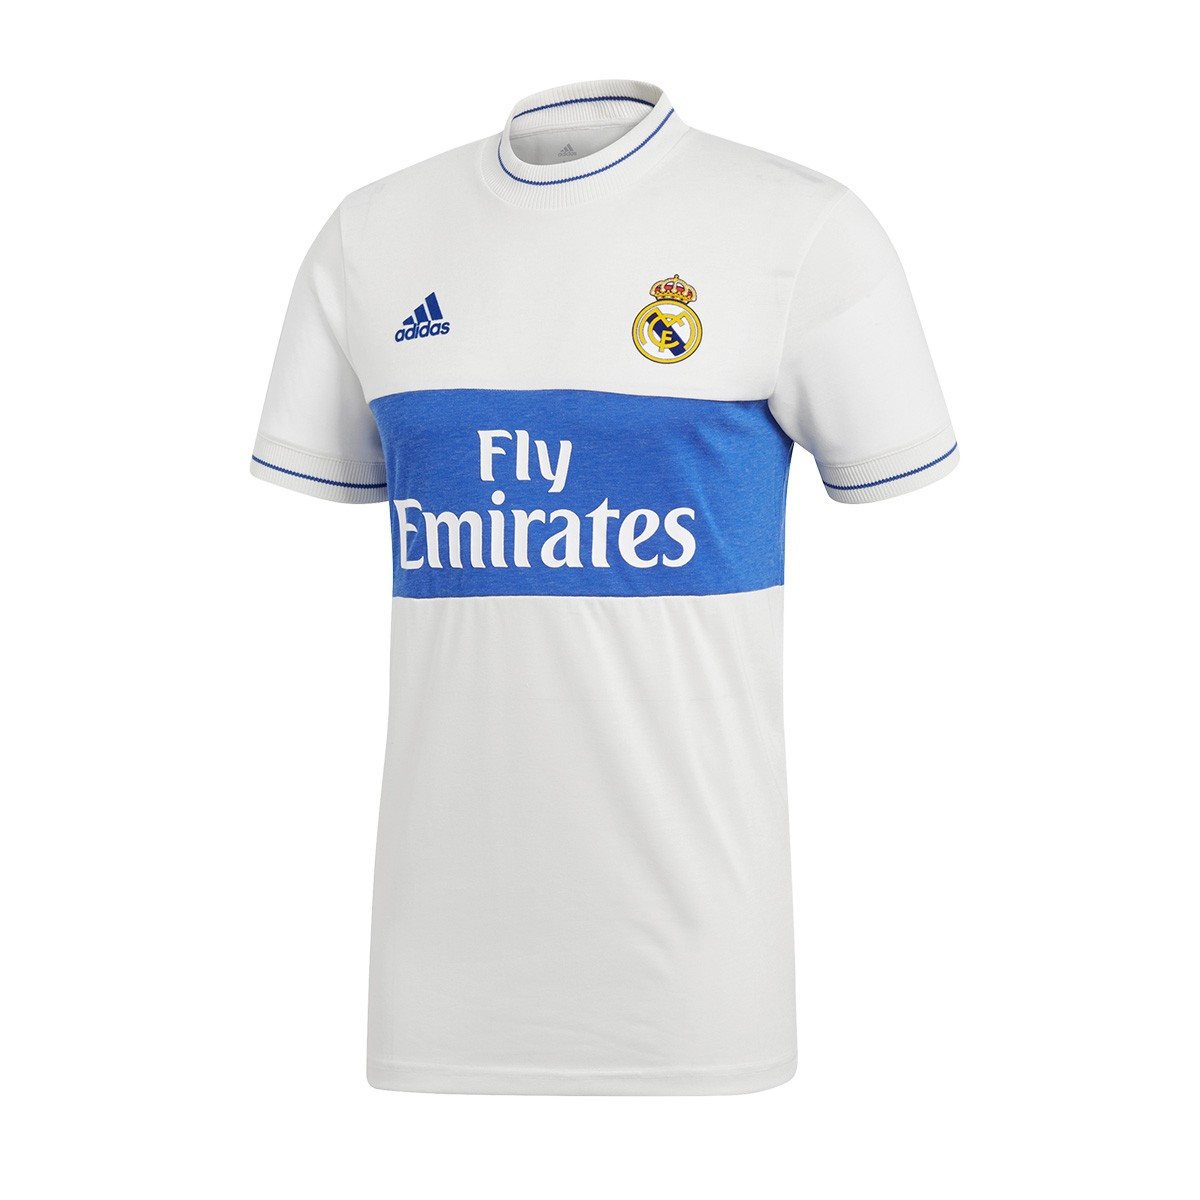 a5edcf5265e Jersey adidas ICON Real Madrid 2017-2018 White-Bold blue - Football ...